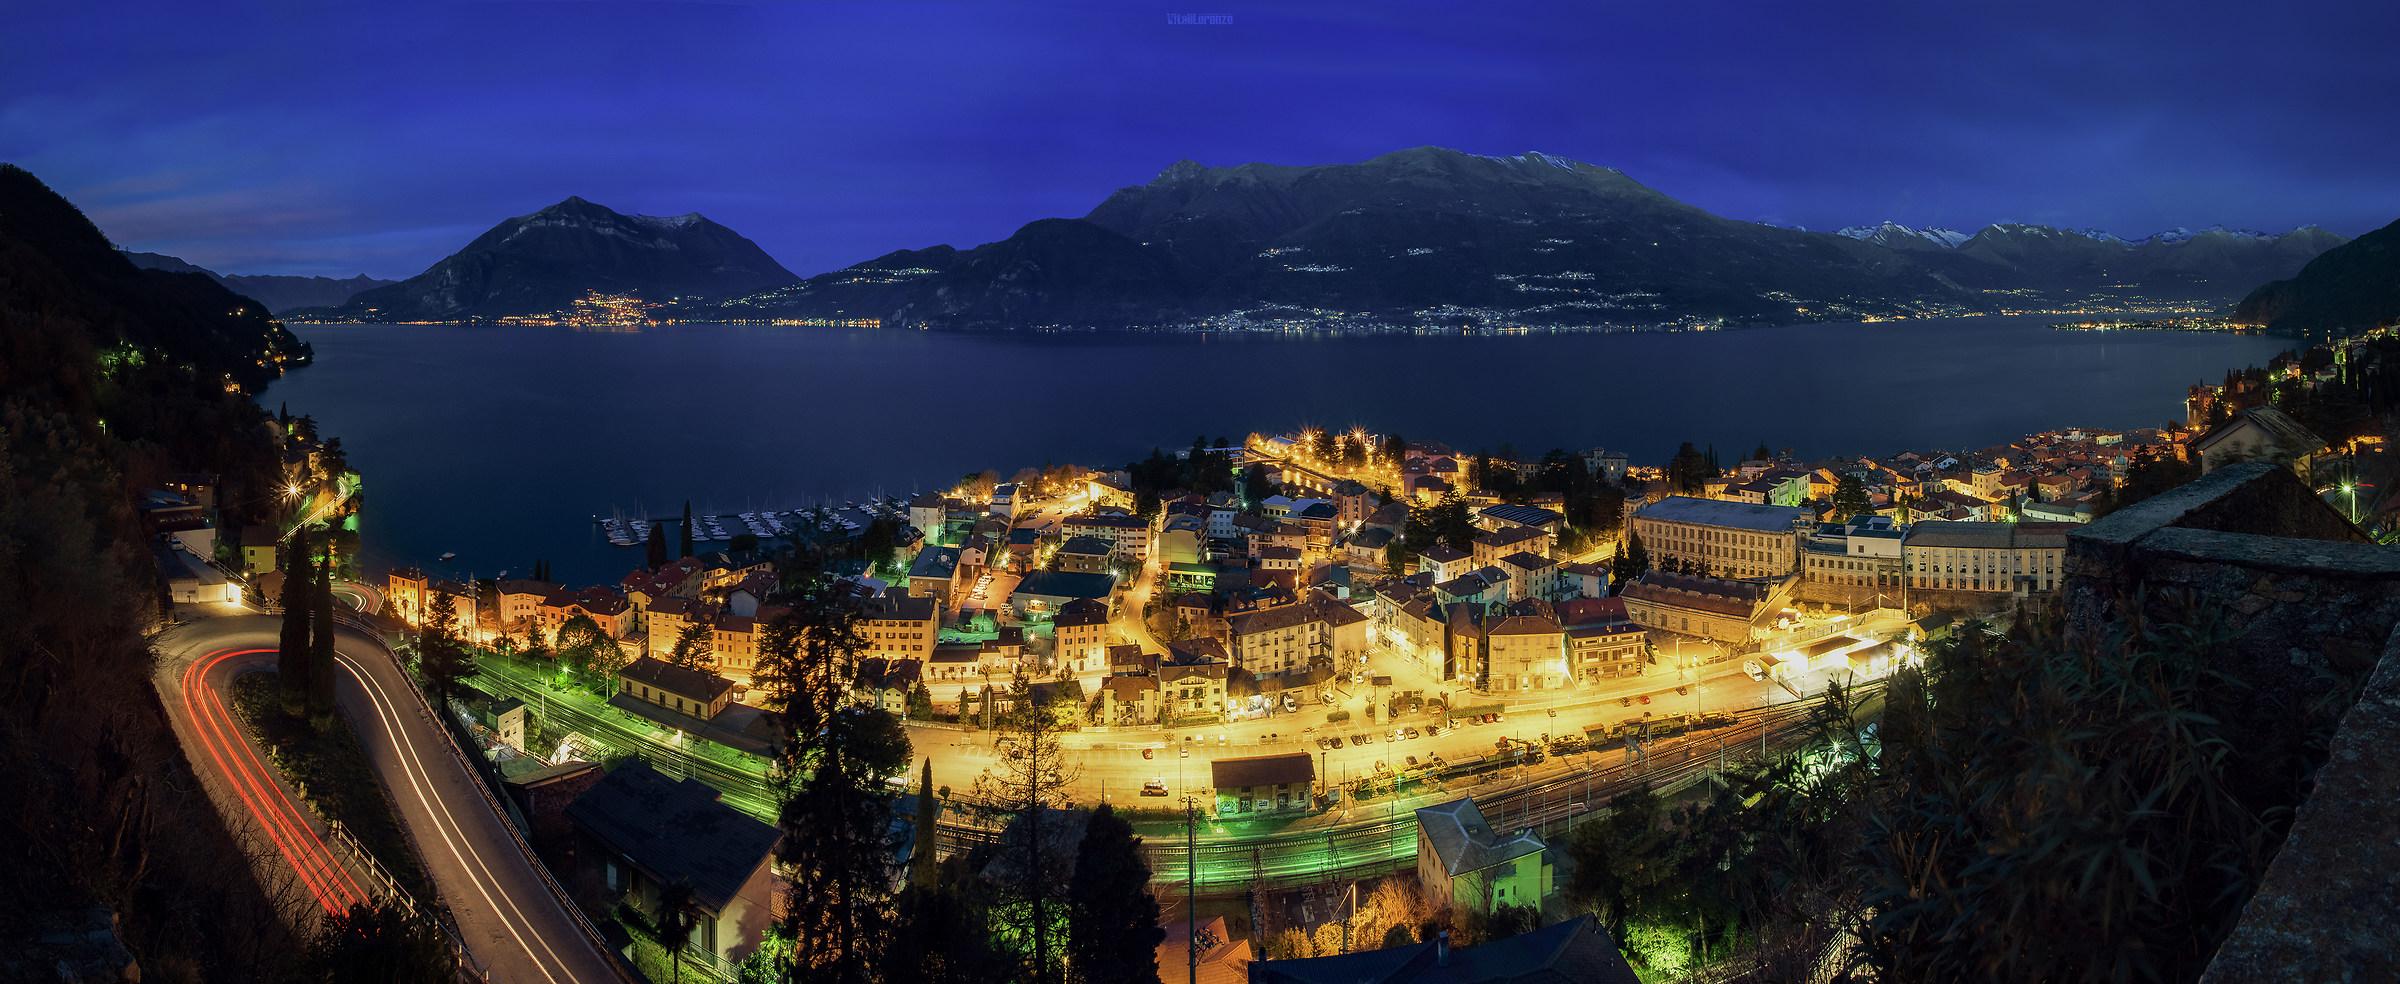 Bellano Overview...